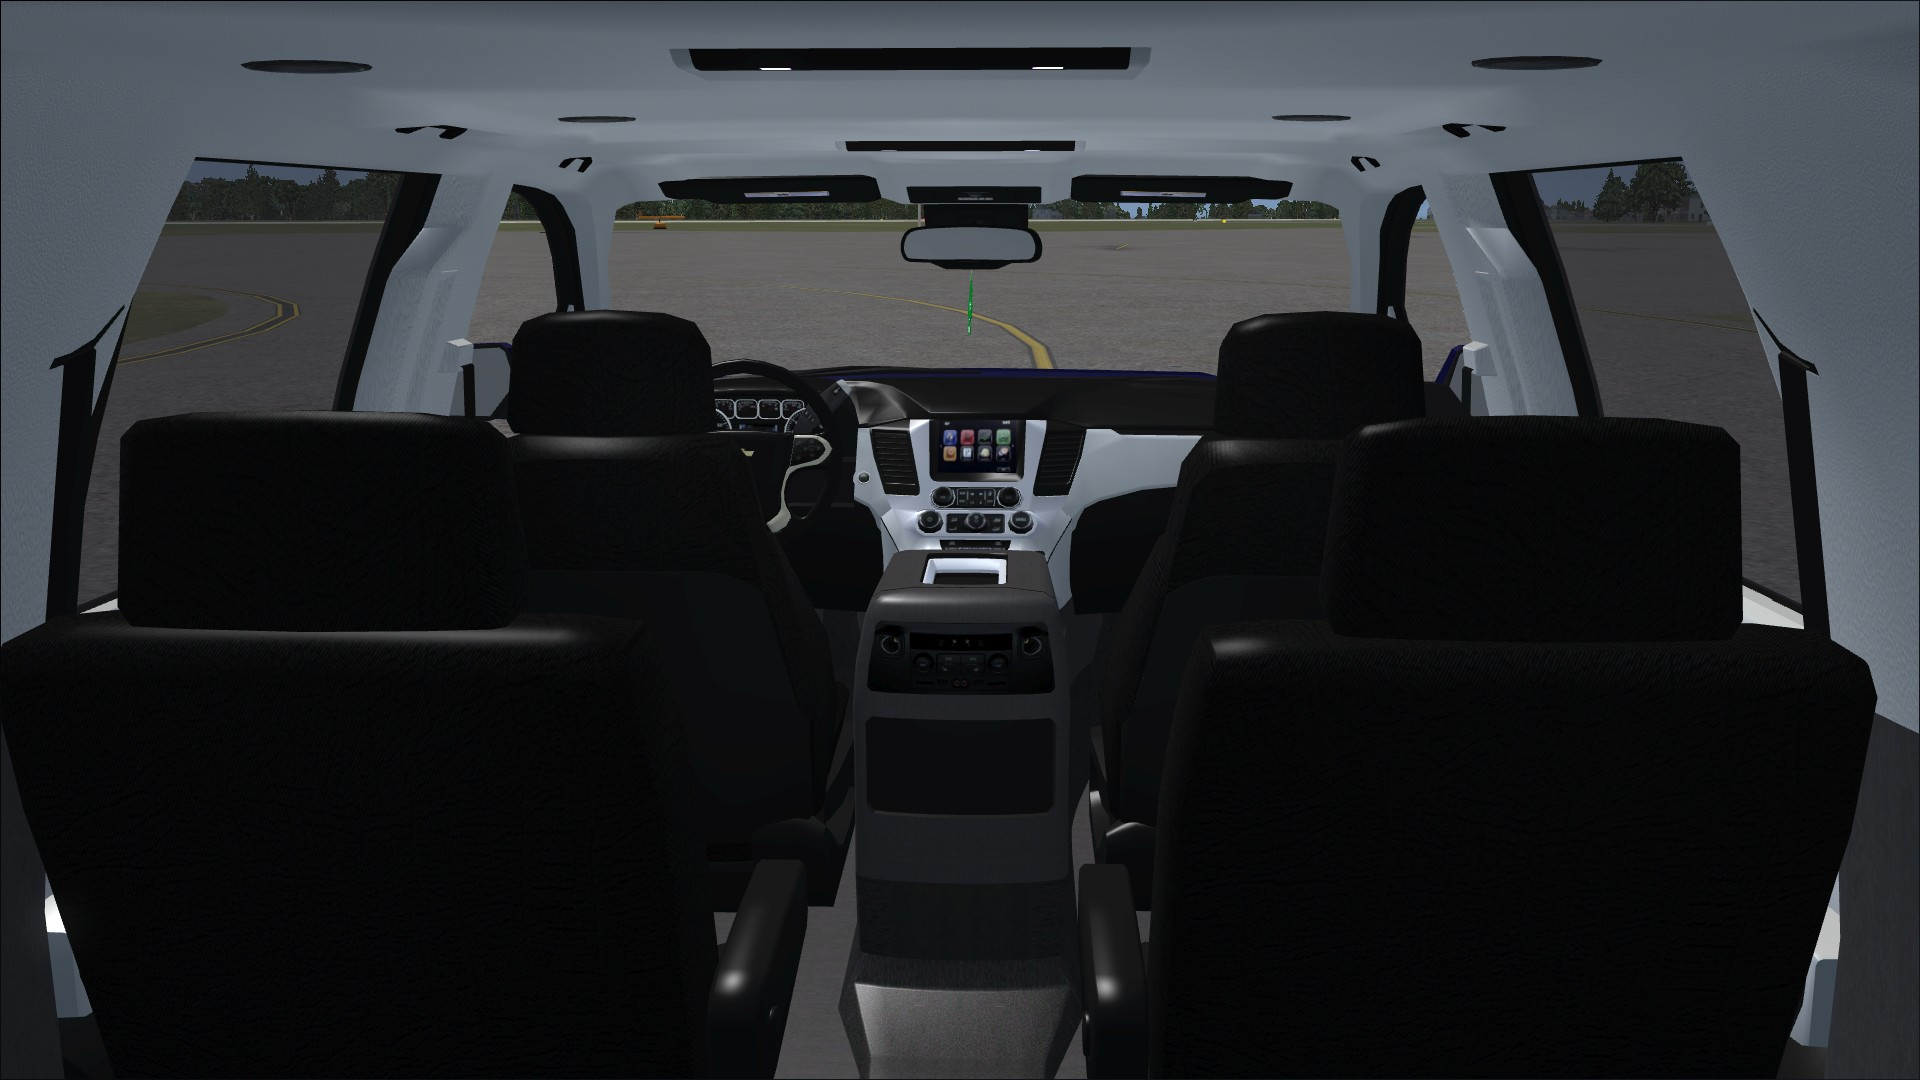 fsx_chevrolet_cockpit_2.jpg